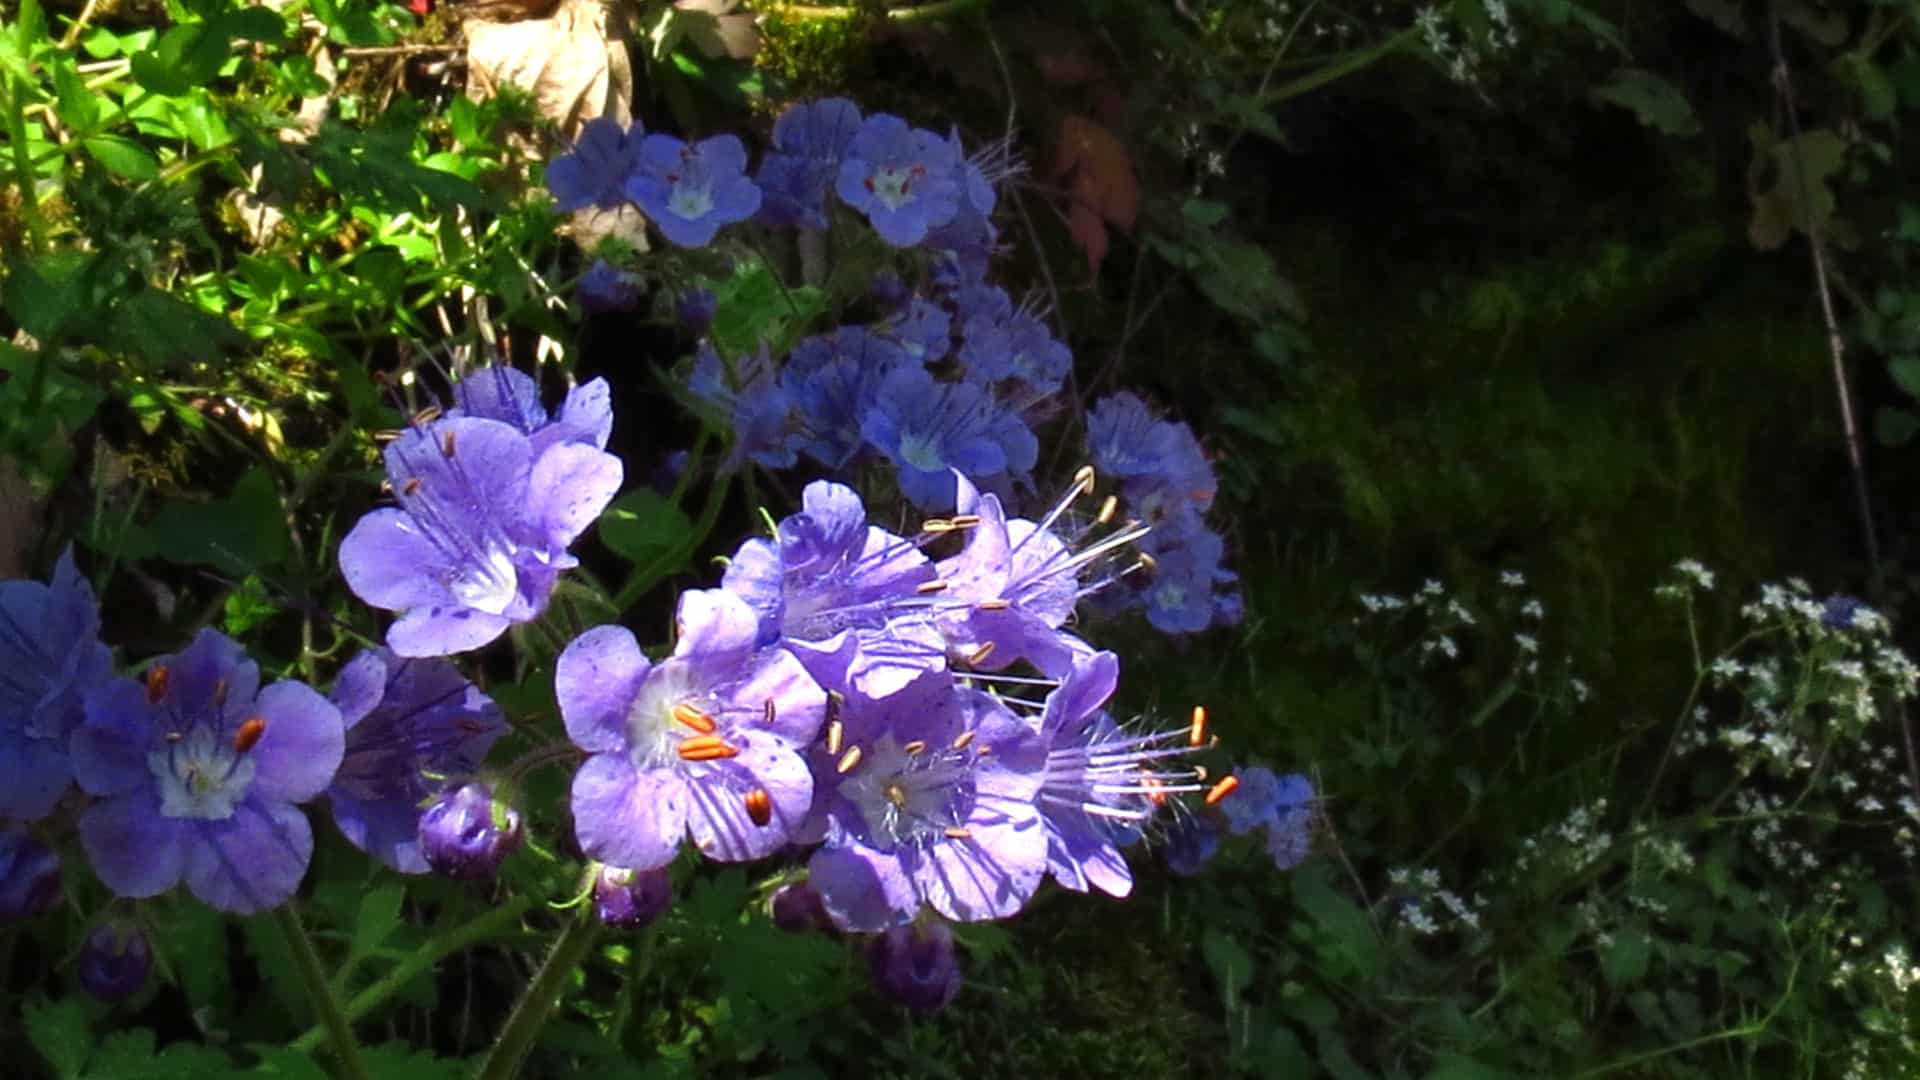 Wild Flowers To Wild Waters Hike In The Nc Smokies